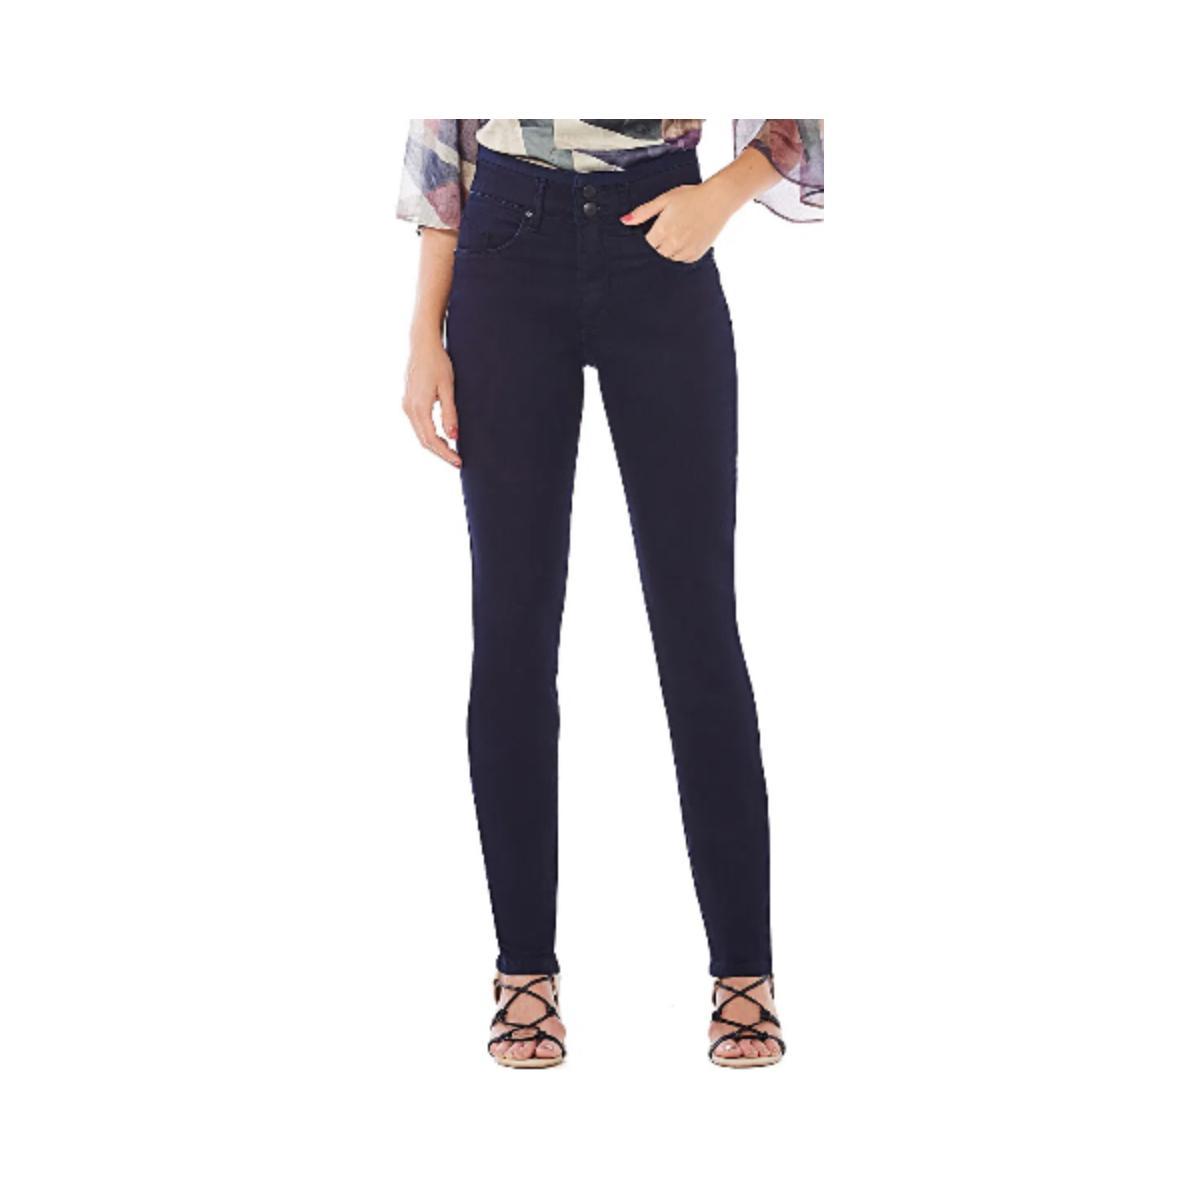 Calça Feminina Maria Valentina 203237 Jeans Escuro